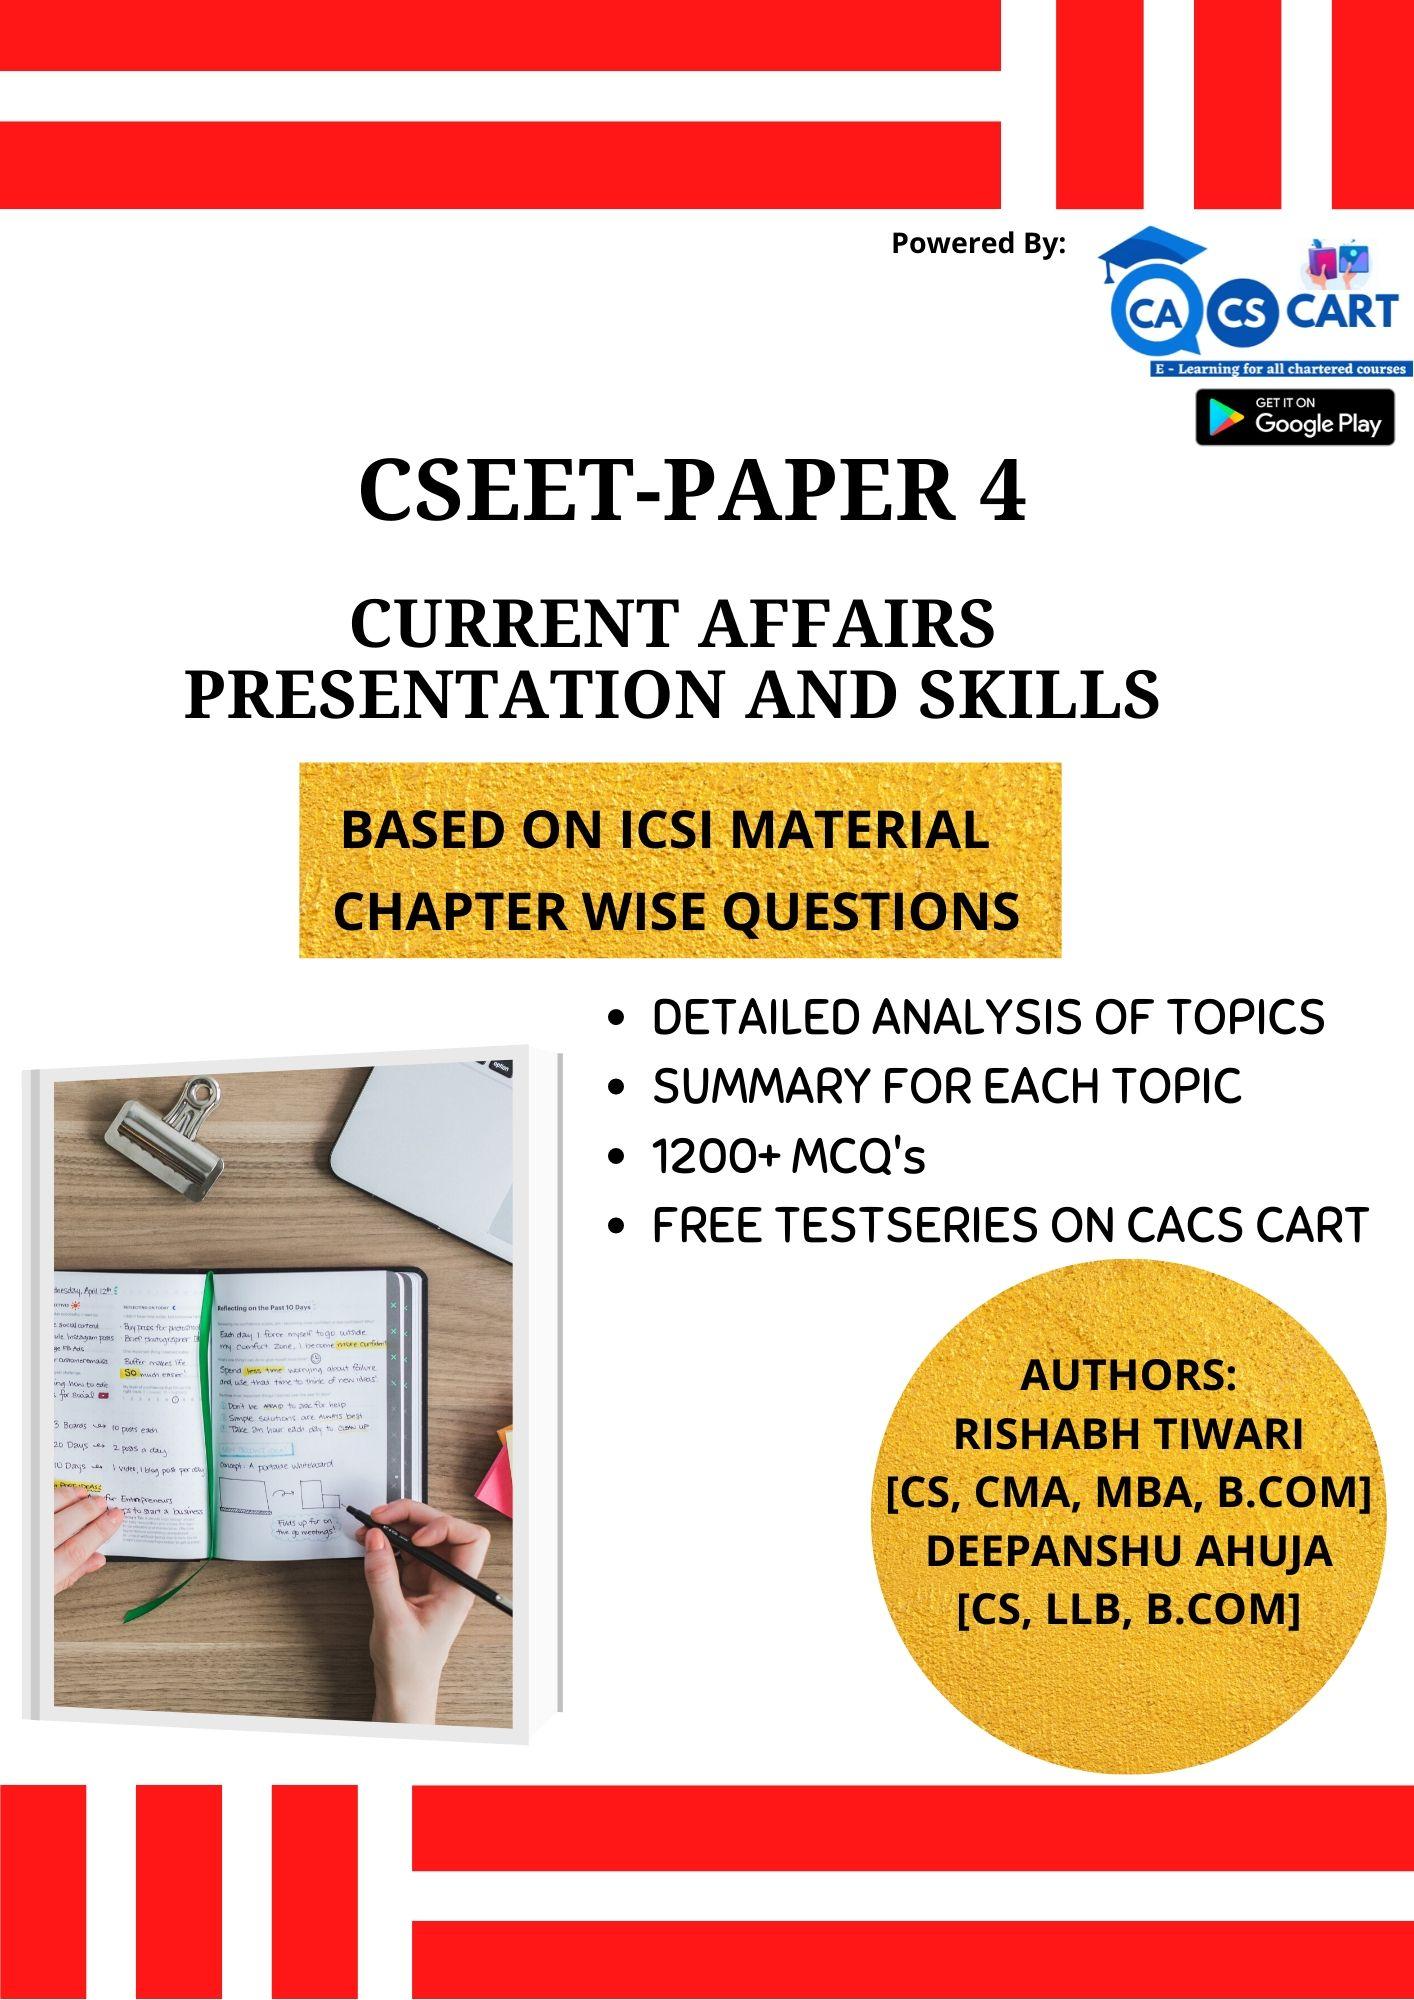 CSEET PAPER 4 Current Affairs Presentation & Skills